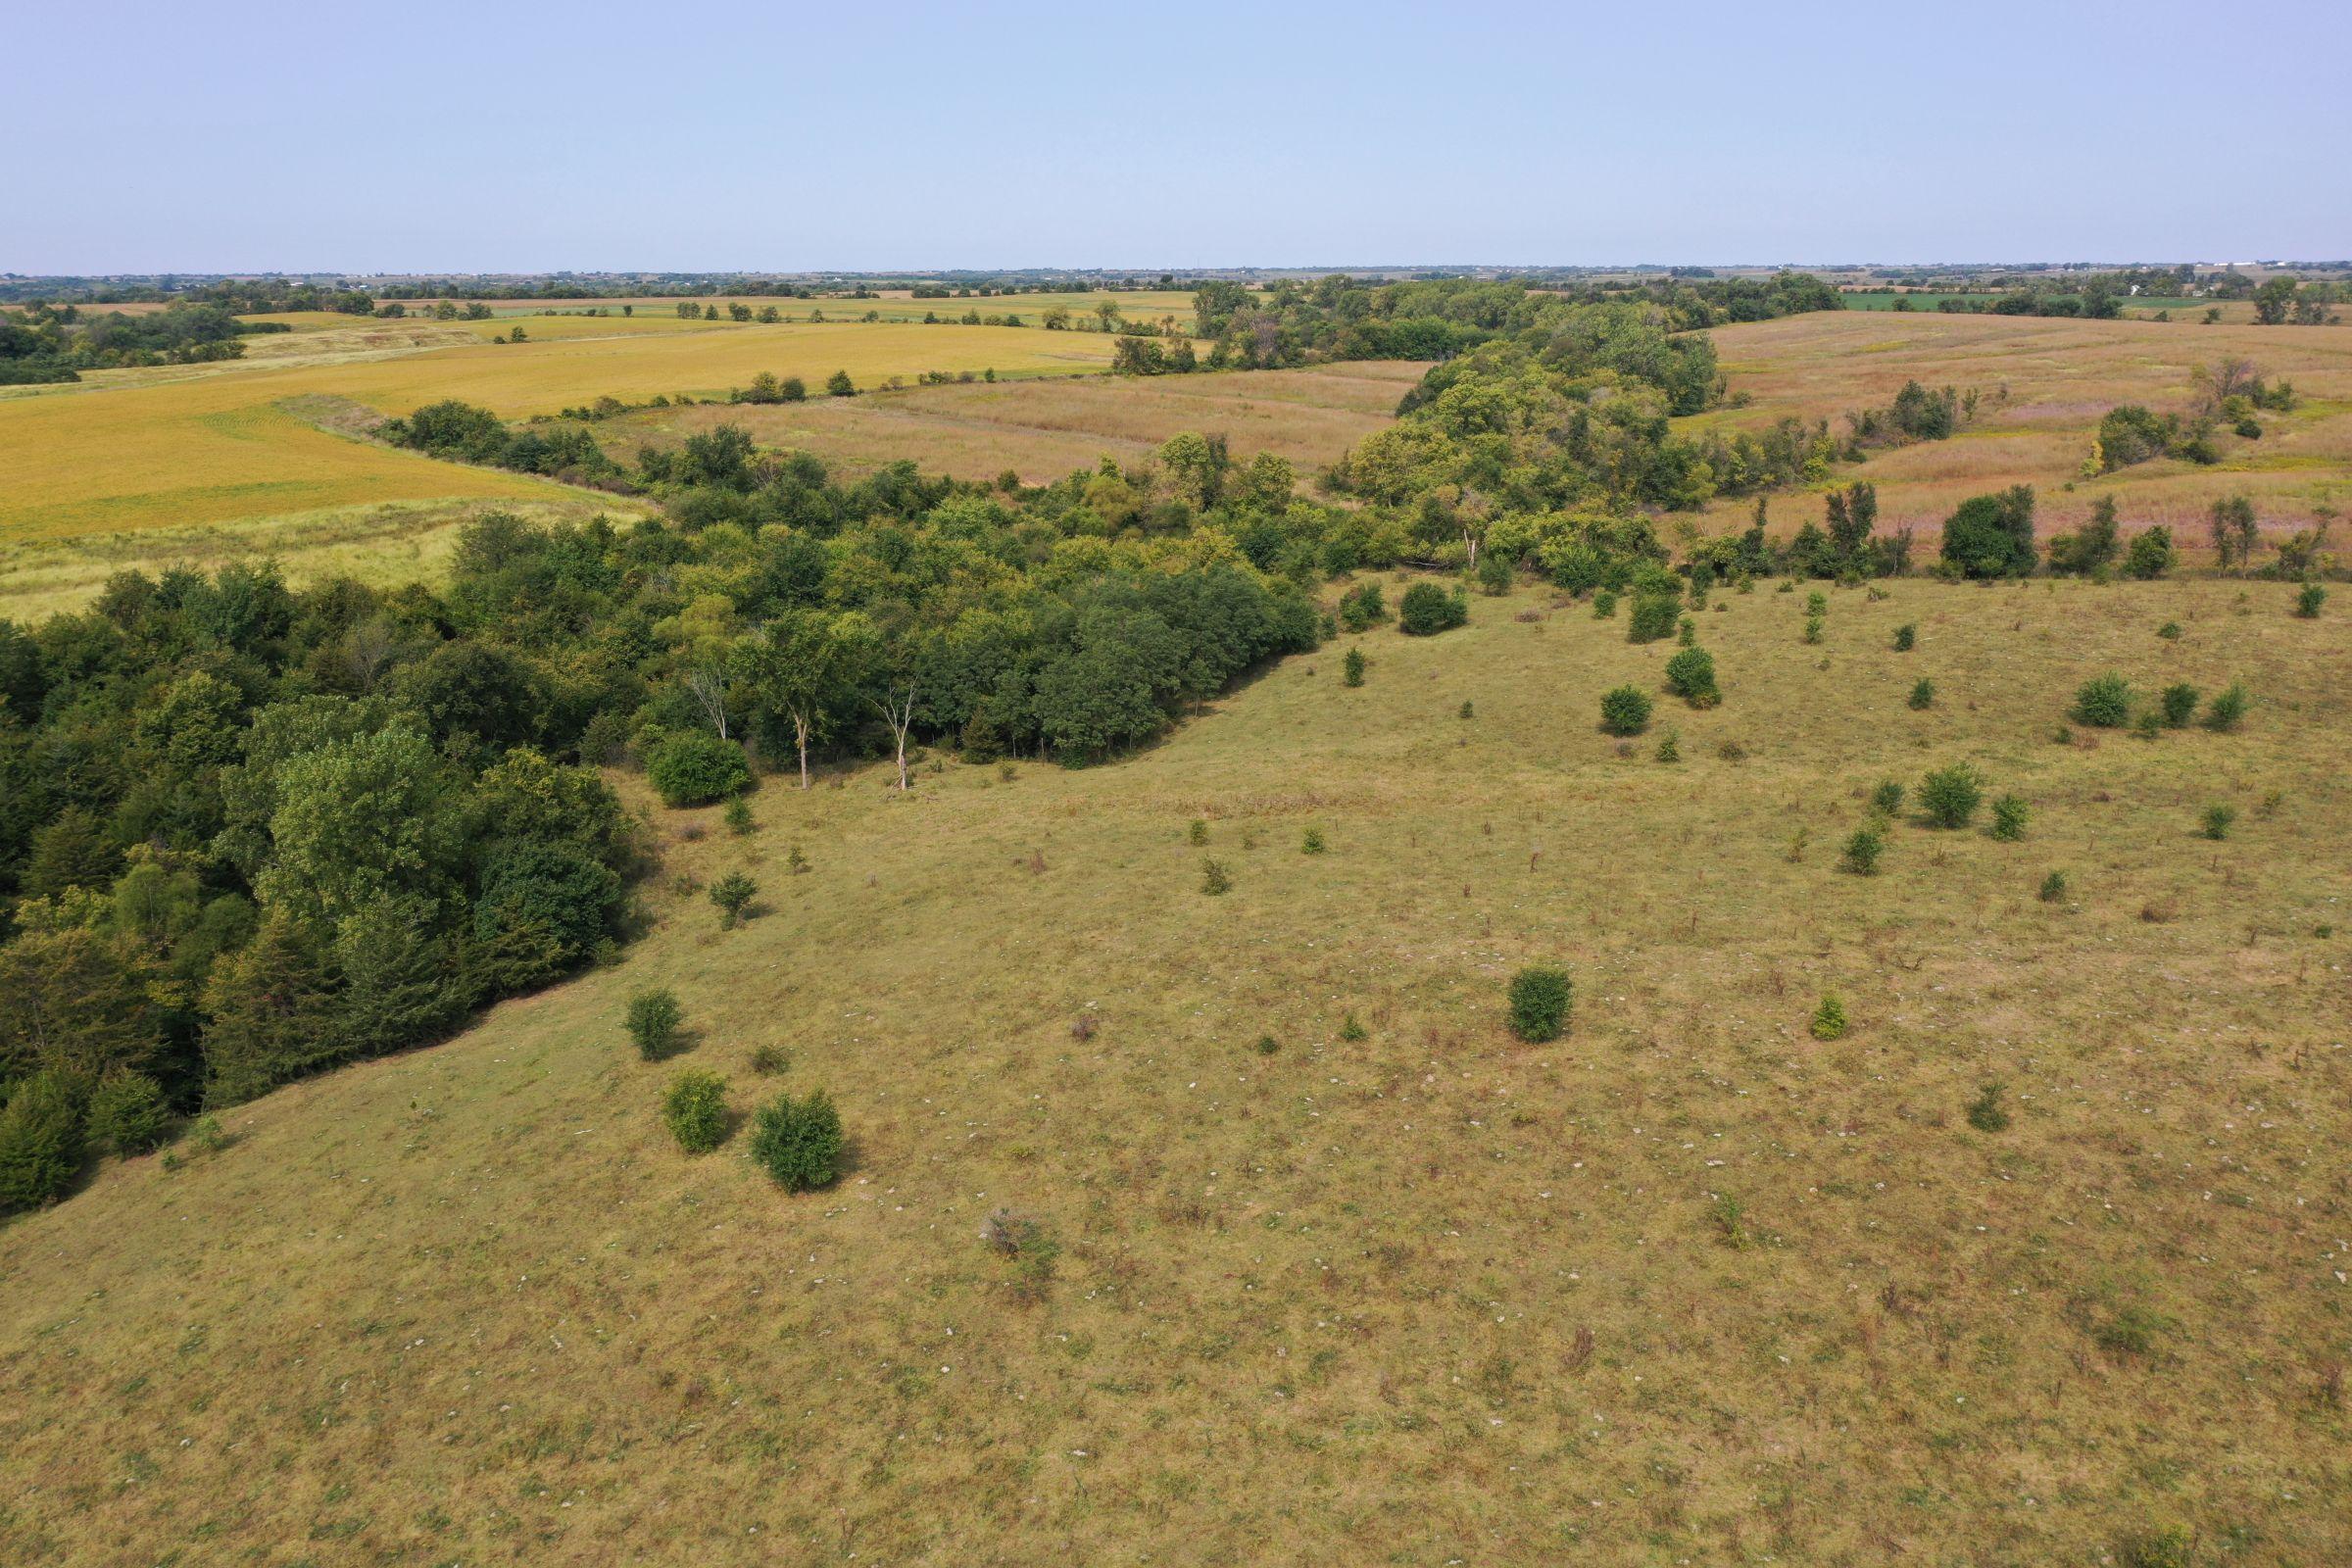 clarke-county-iowa-37-acres-listing-number-15398-1-2021-03-08-151446.jpg